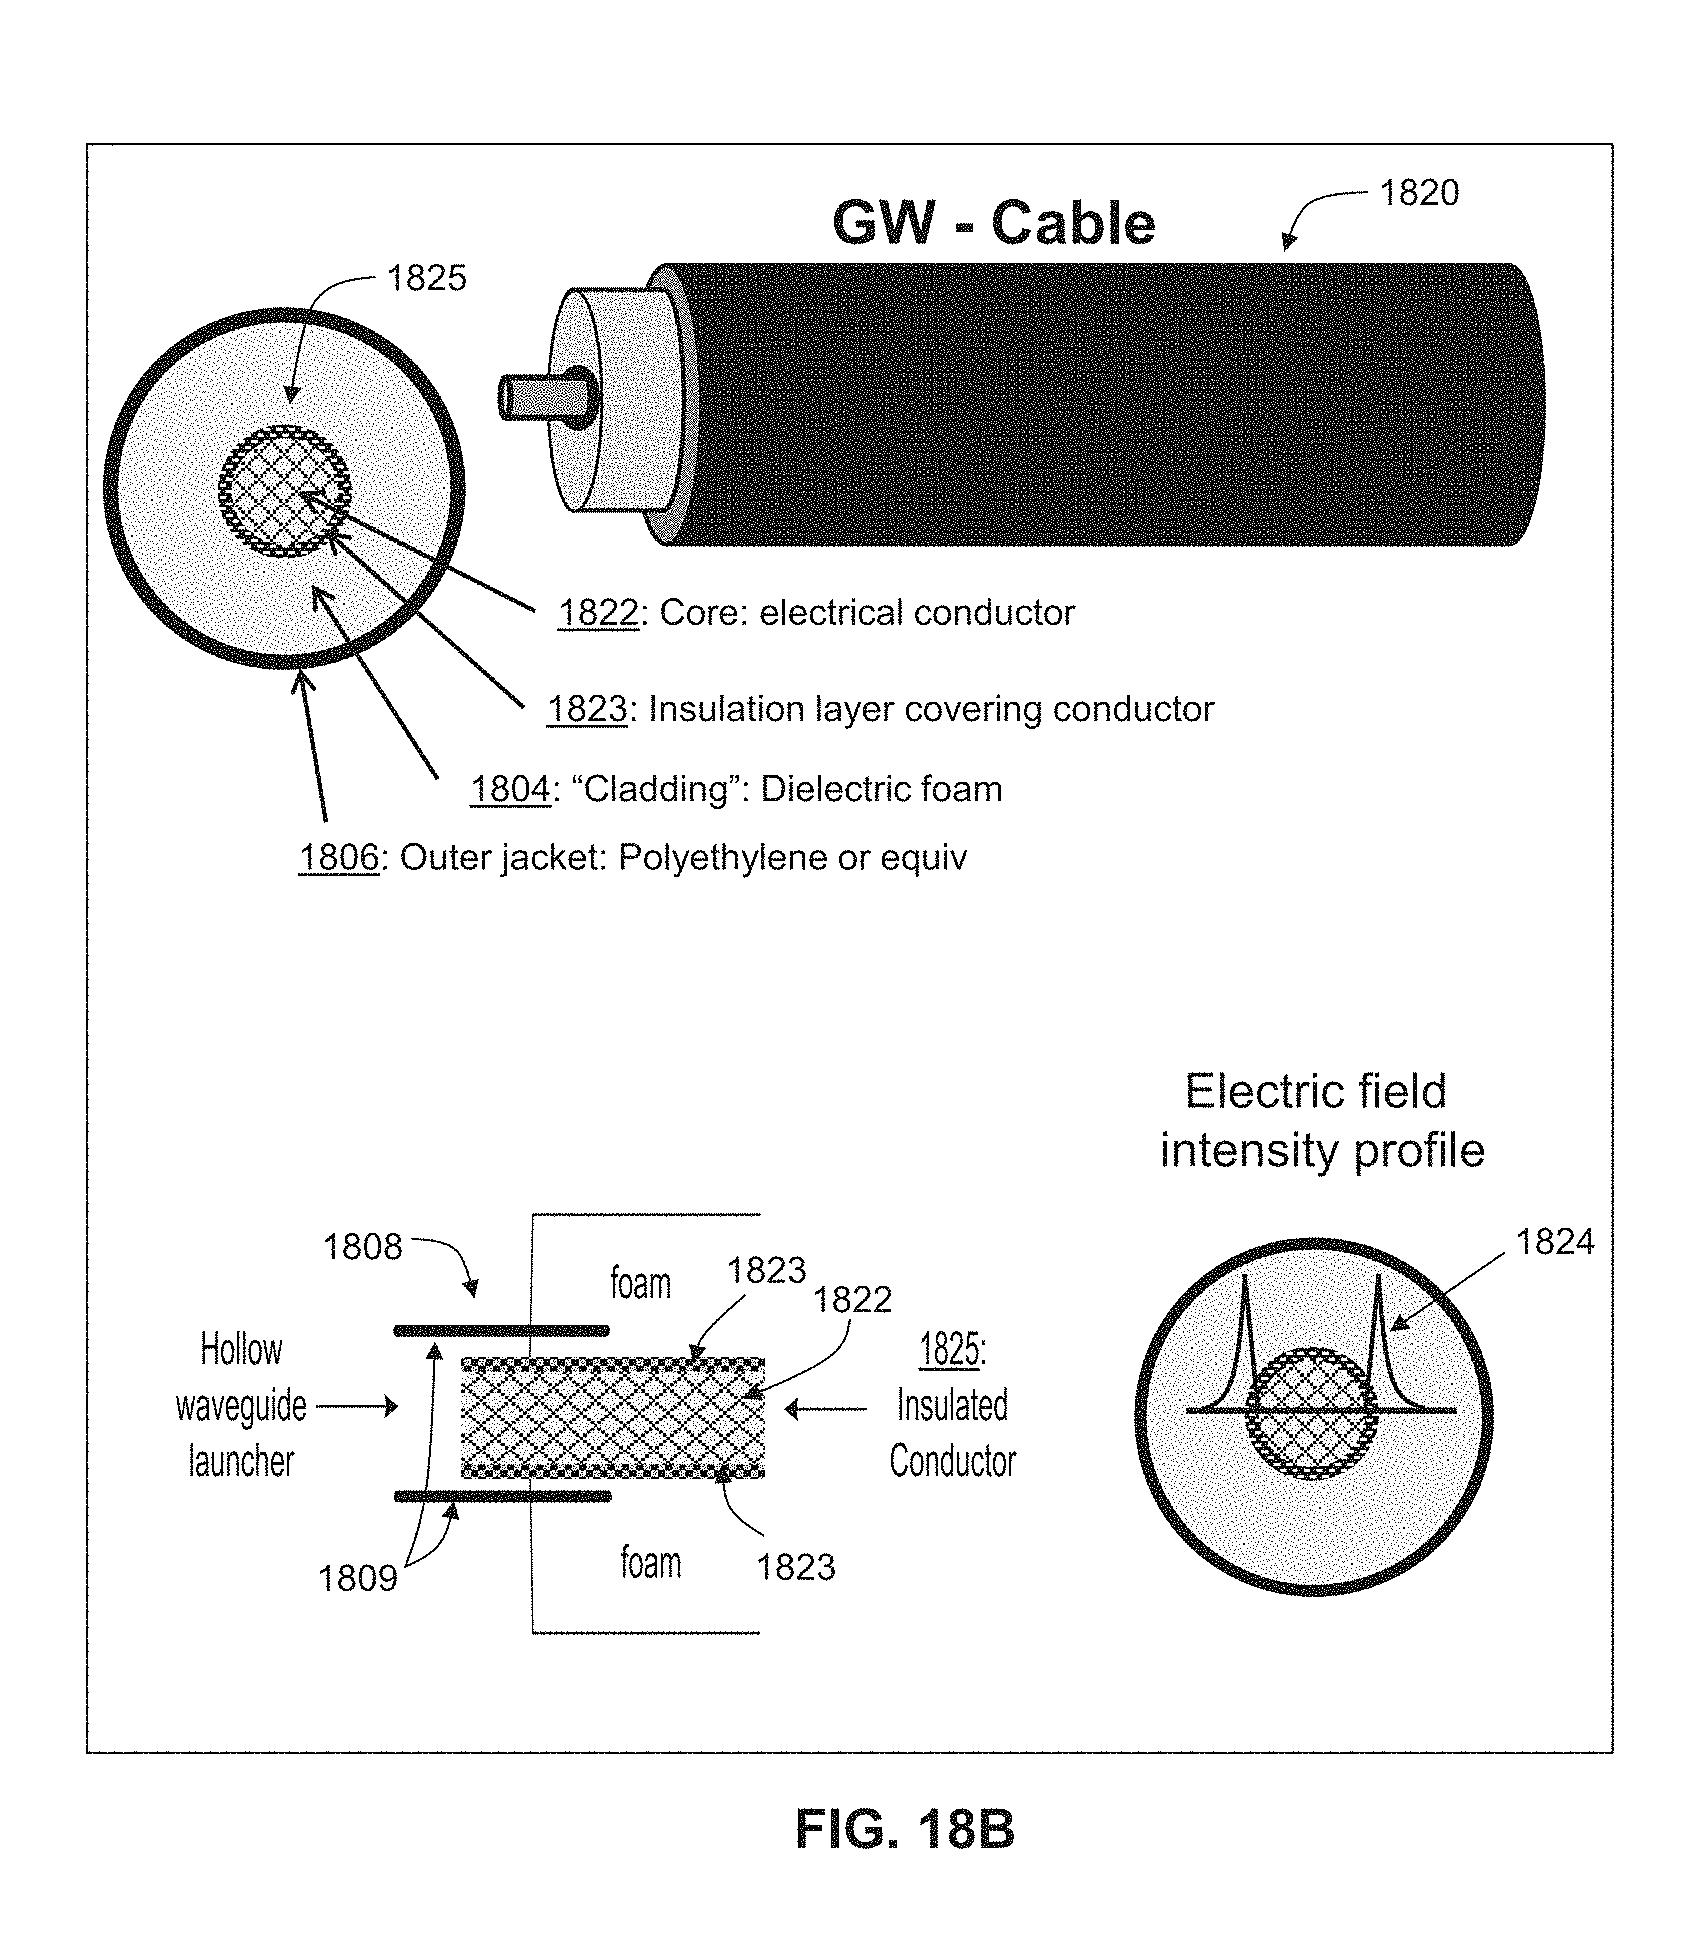 case ih wiring schematic 1822 electricity sitecase ih wiring schematic 1822 wiring diagram